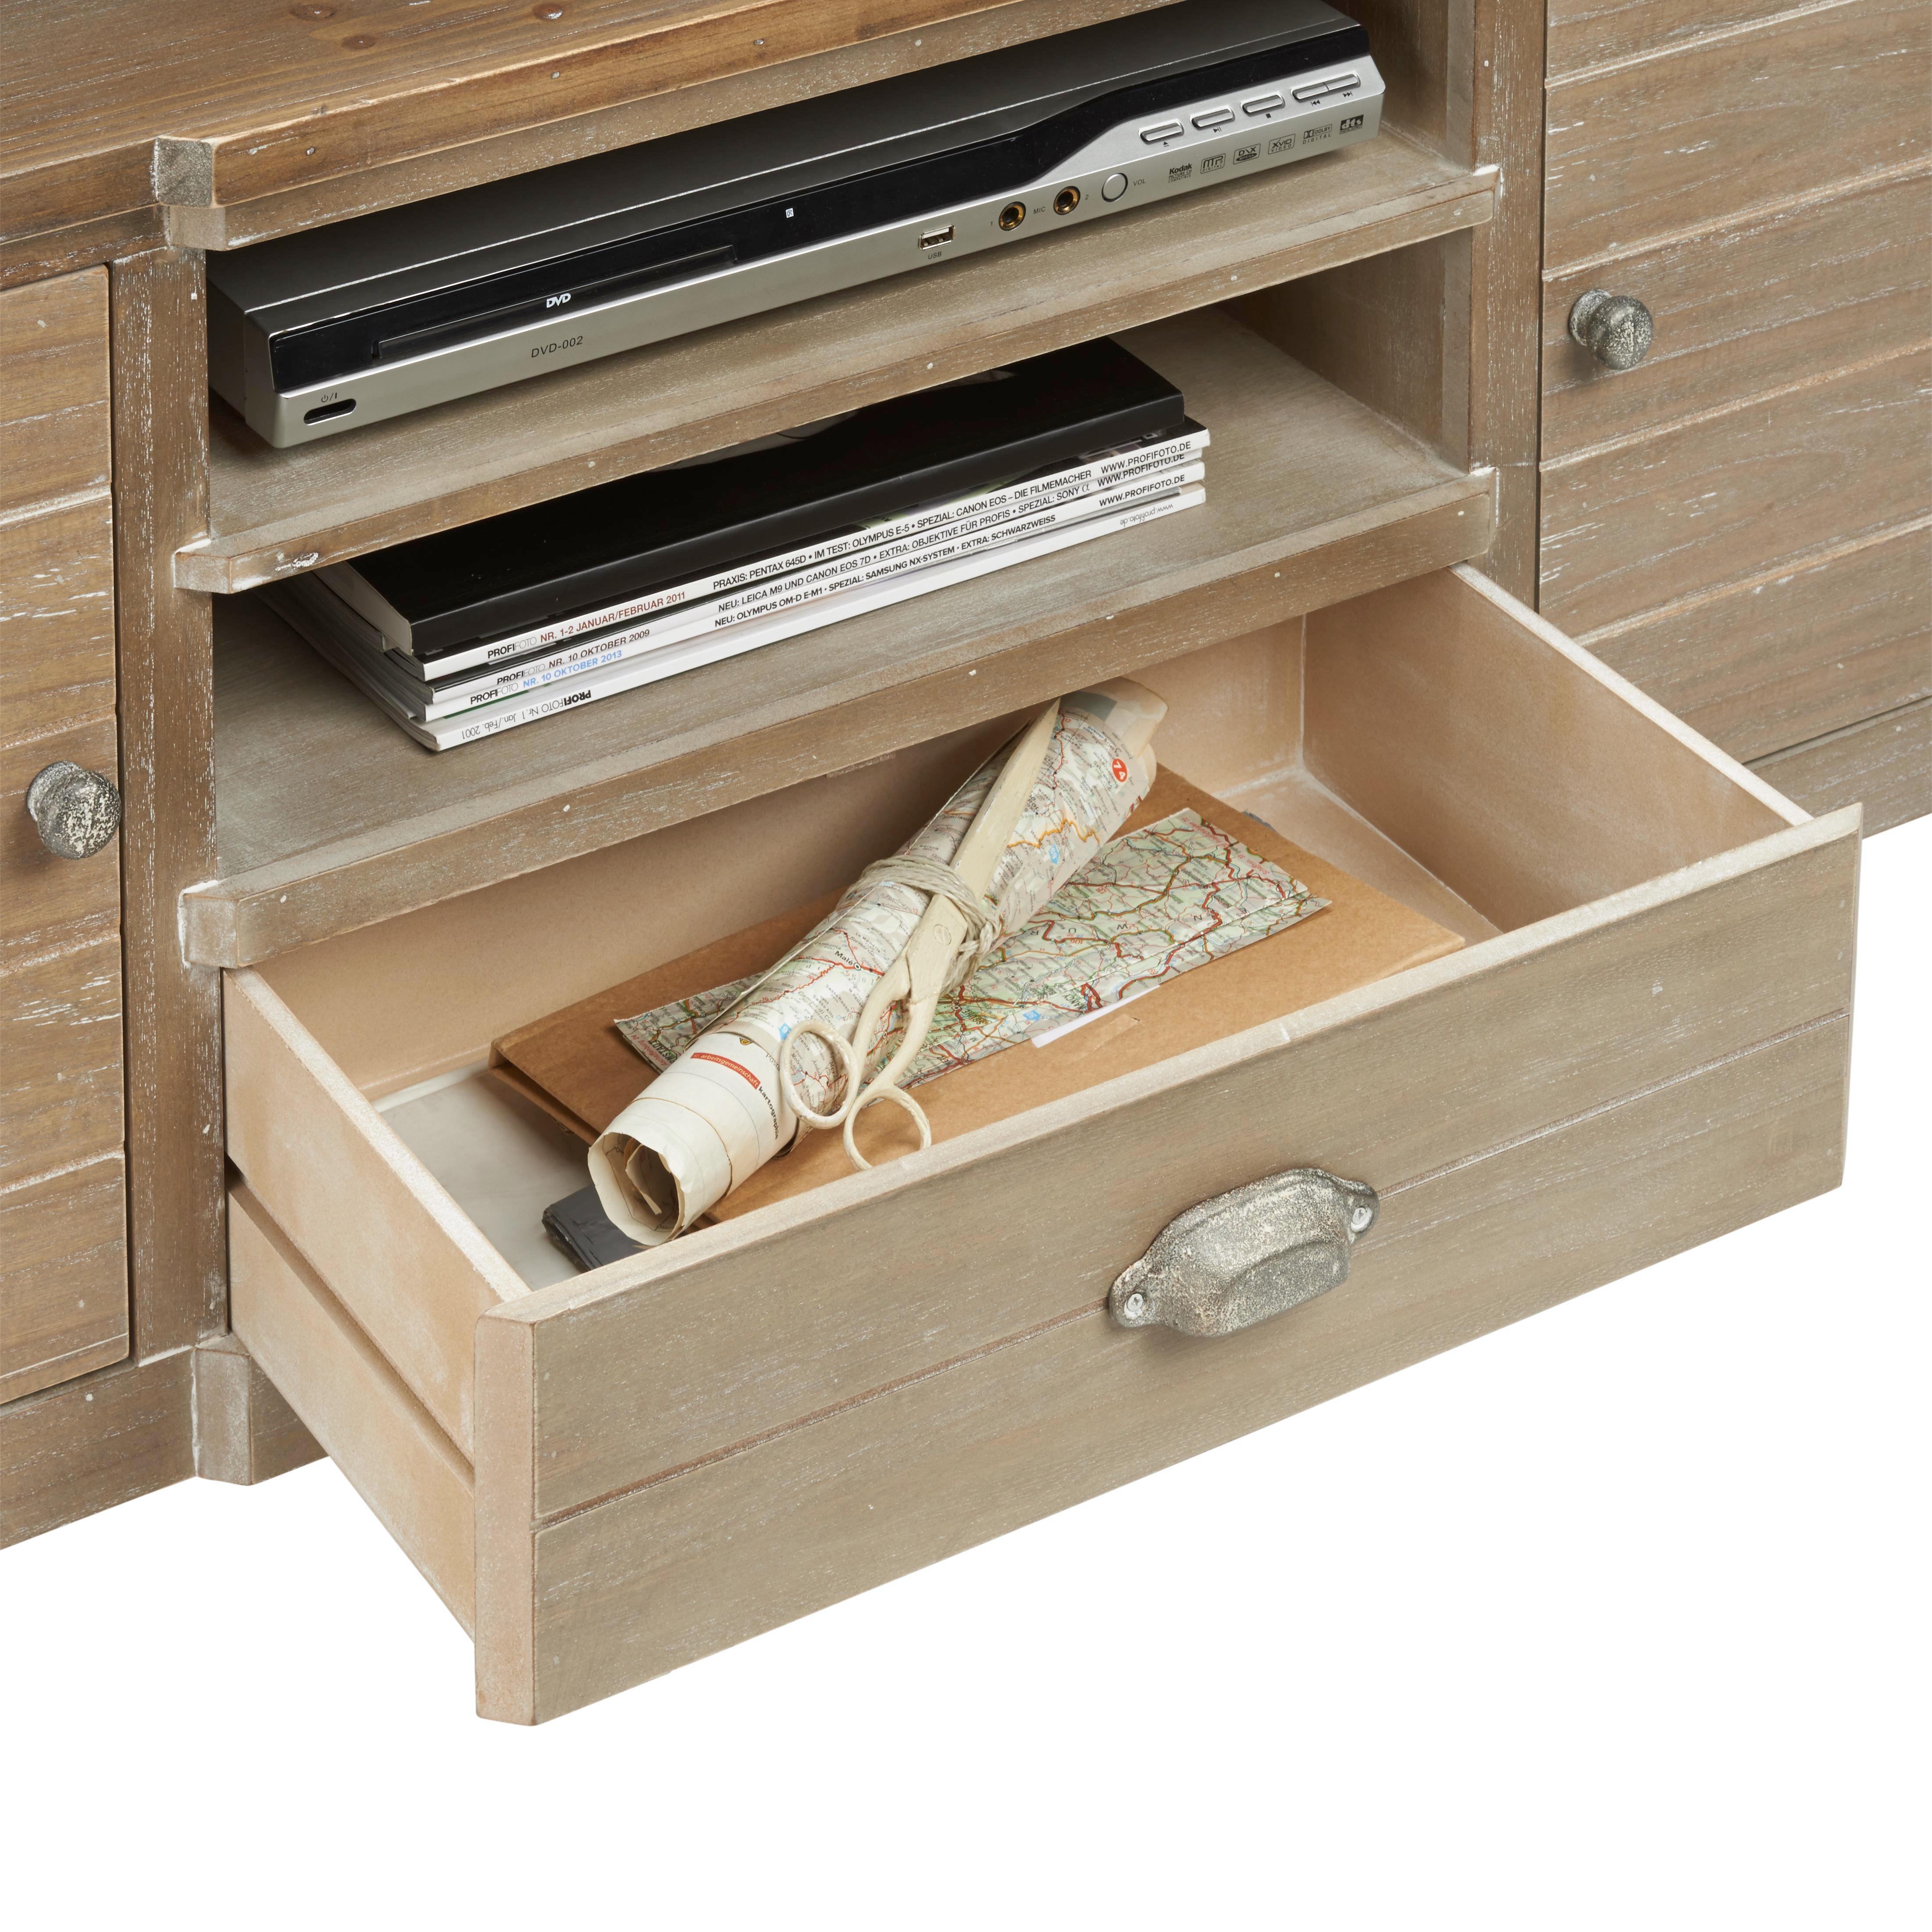 TV-Element Savannah Antik - Braun, Holz/Metall (121,5/54/36,5cm) - PREMIUM LIVING